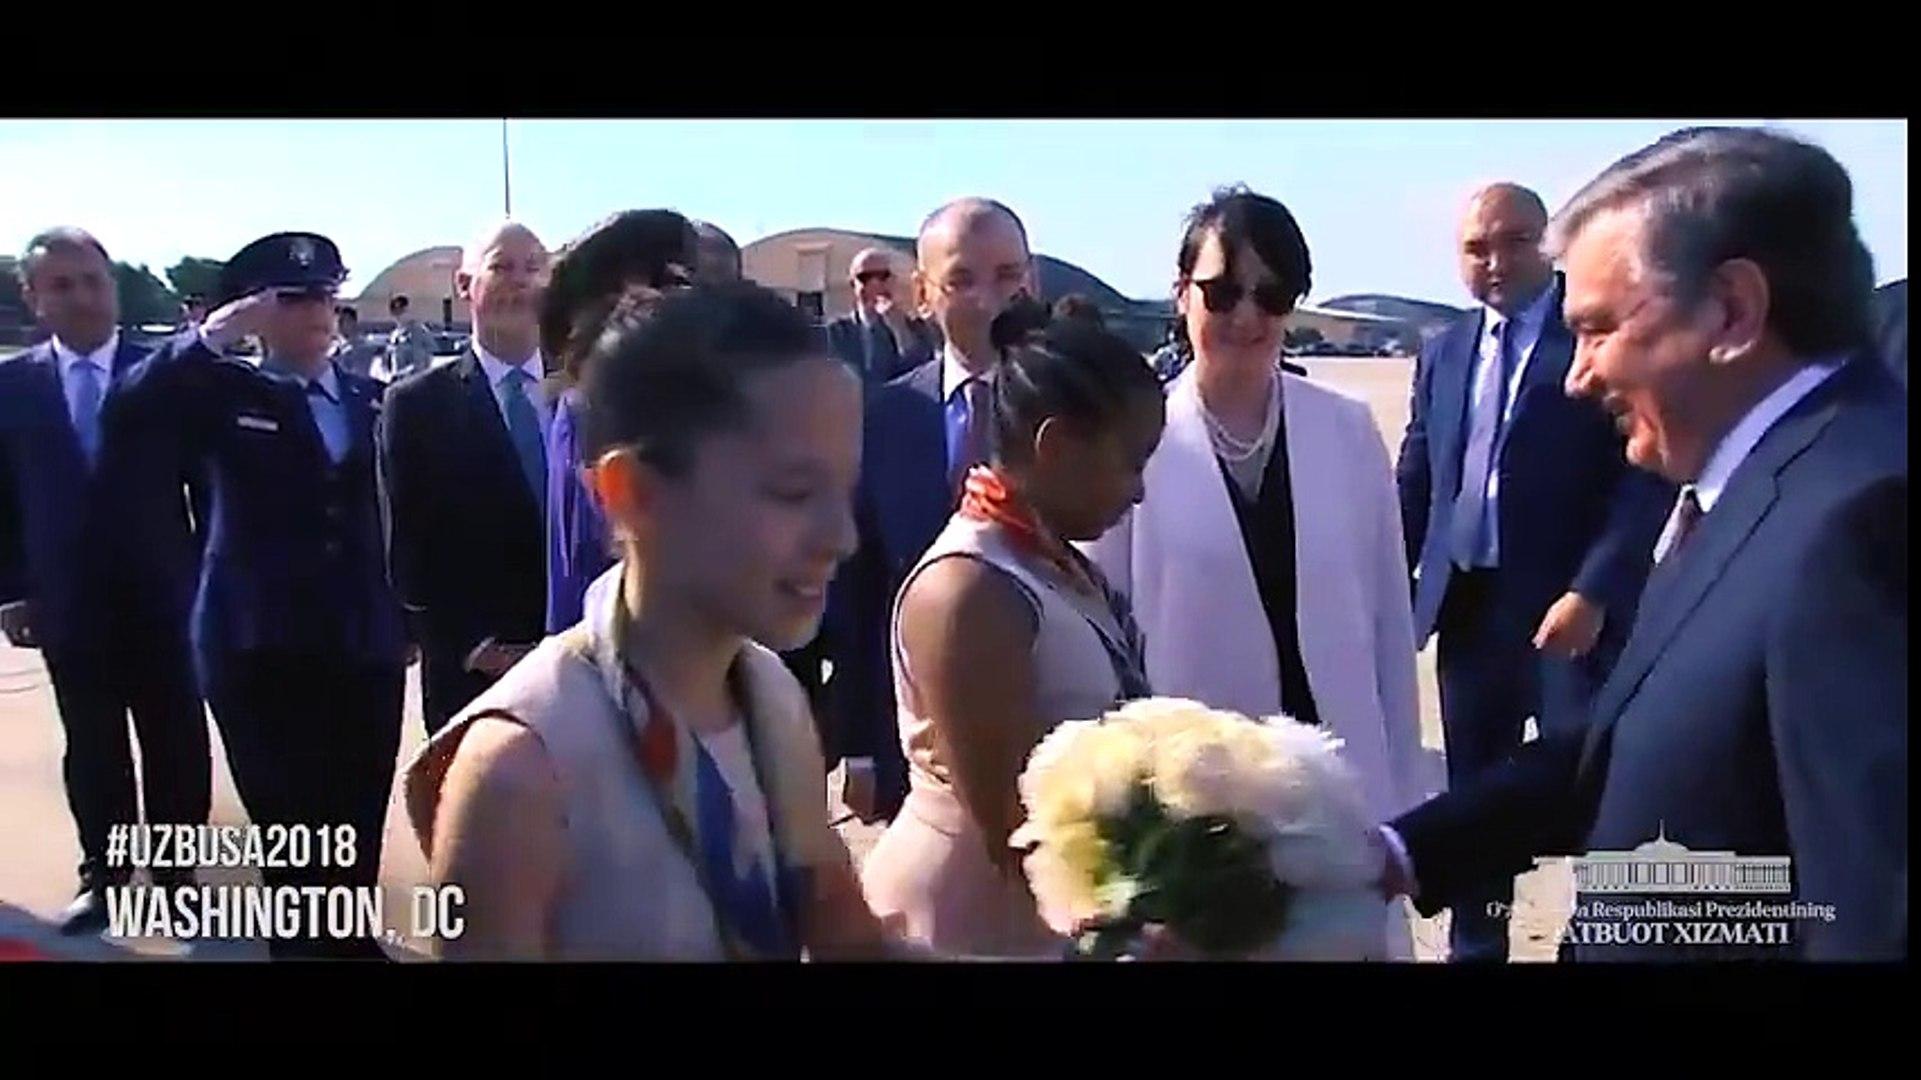 ВИДЕО ДНЯ: Президент Шавкат Мирзиёев м Первая леди Зироатхон Хошимова прибыли в США!